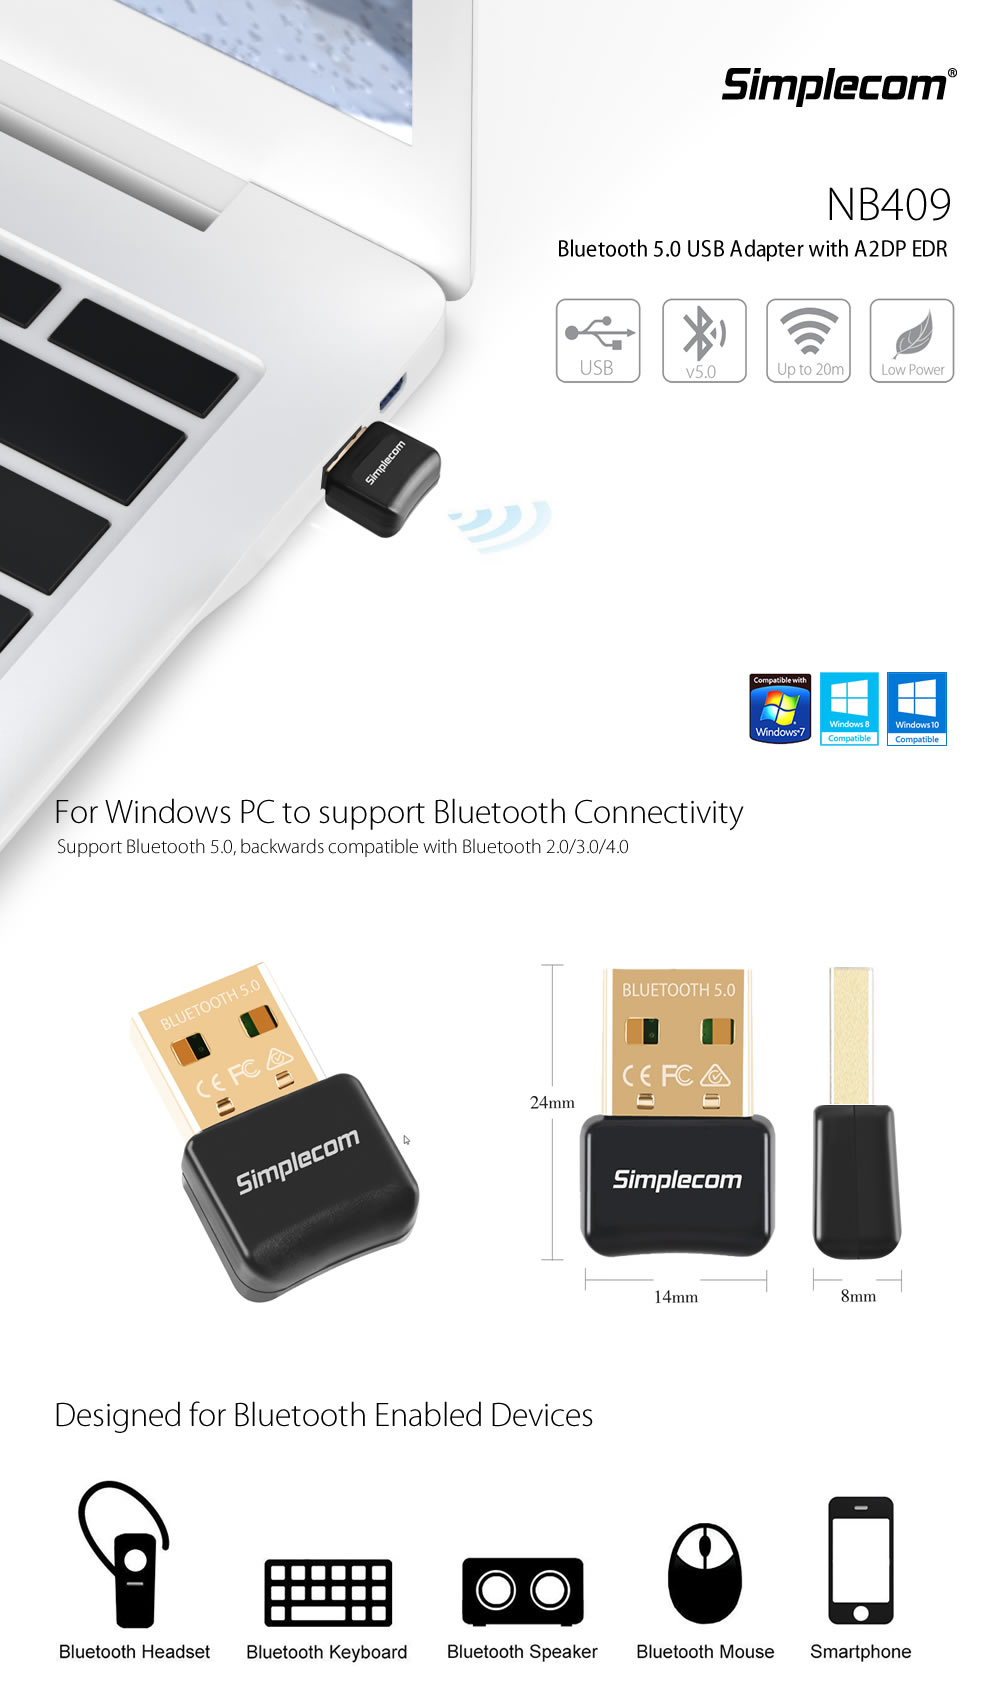 Simplecom Nb409 Usb Bluetooth 5 0 Adapter Wireless Dongle